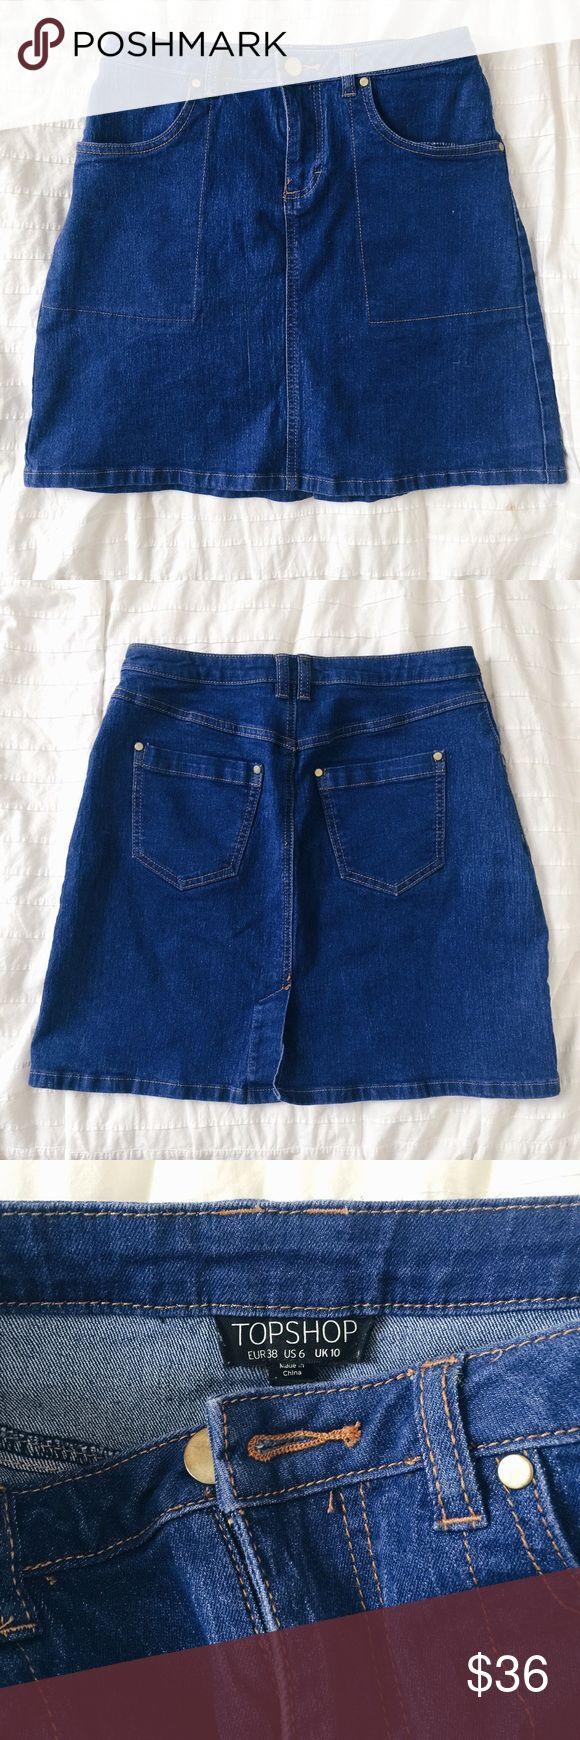 Topshop Blue Jean Stretch Denim Skirt Topshop A line jean skirt in bright blue denim with brass hardware. Topshop Skirts Mini